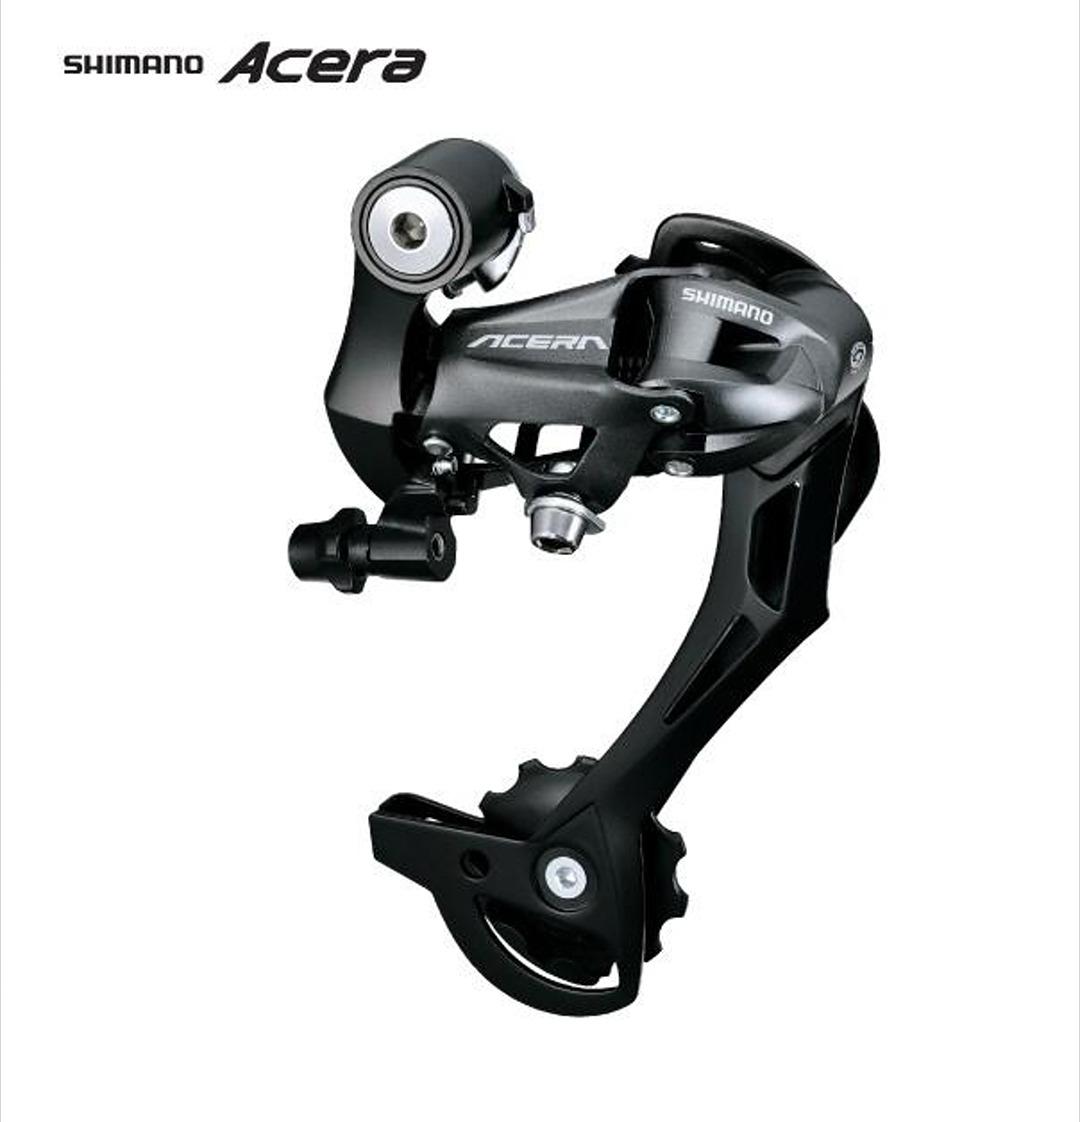 c1abf92f488 Cambio Trasero Shimano Acera Rd-m390 9 Velocidades (8/9 Vel ...